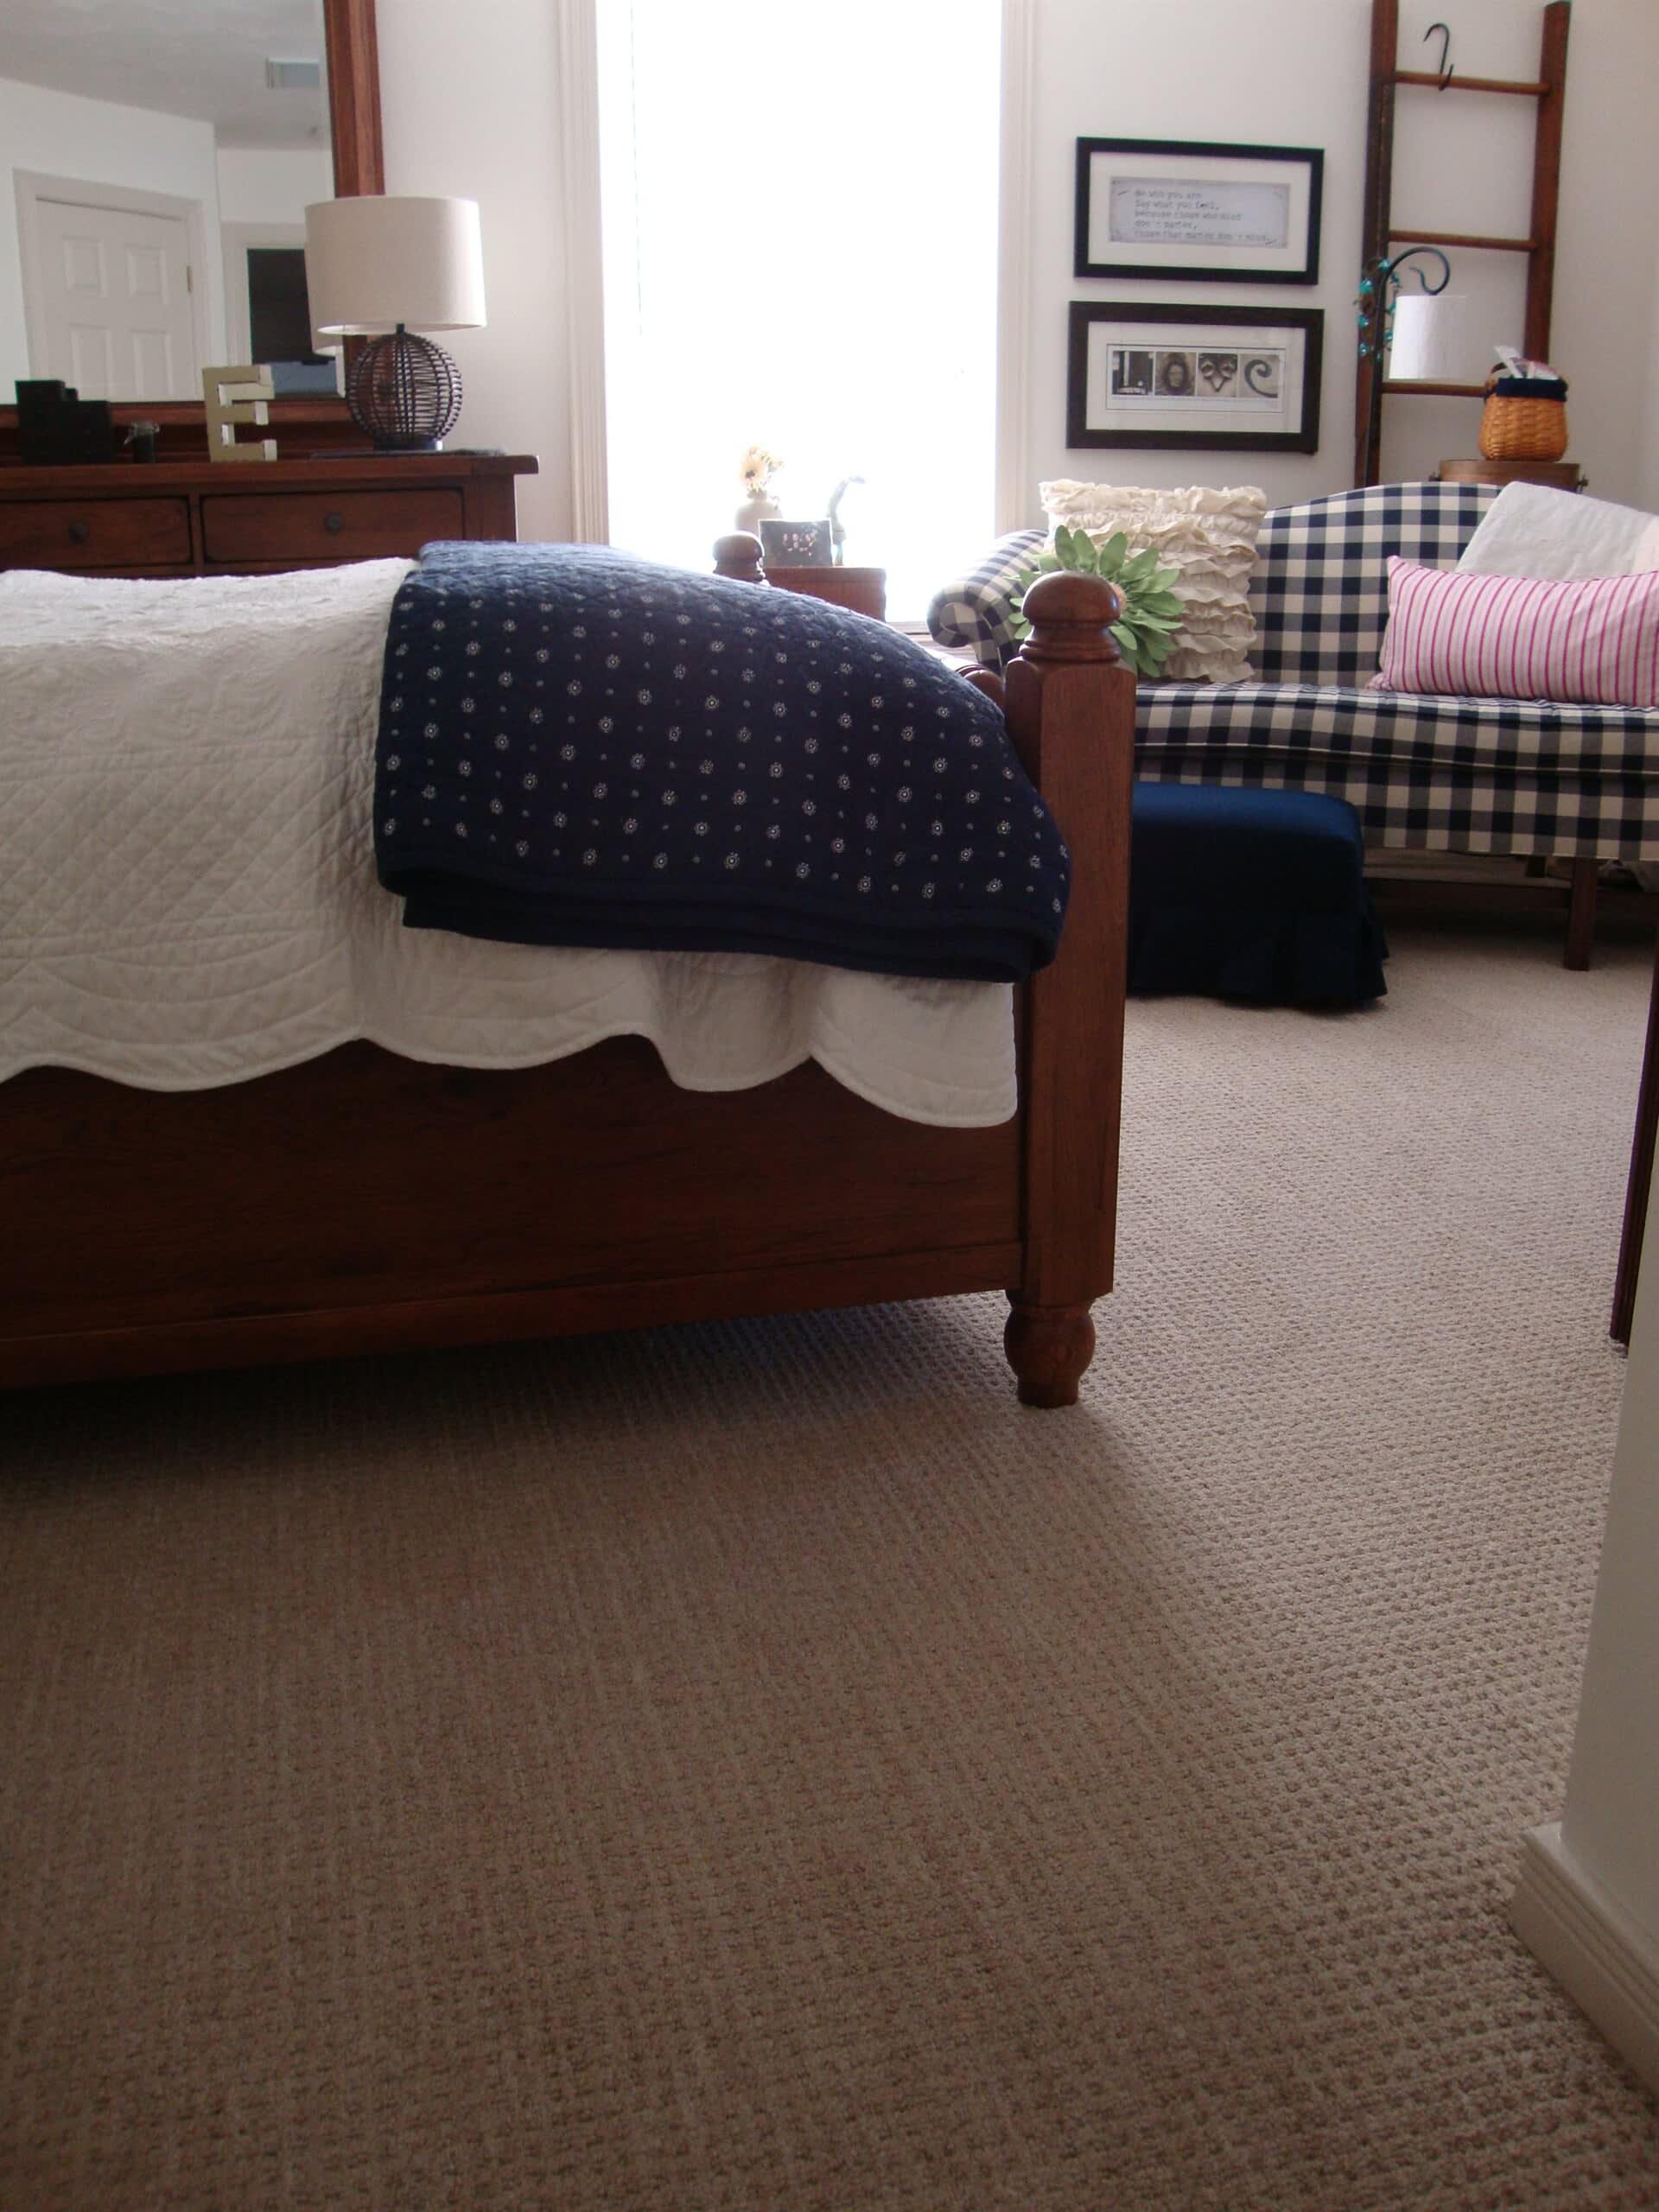 Durable carpet in Norfolk, VA from Floors Unlimited